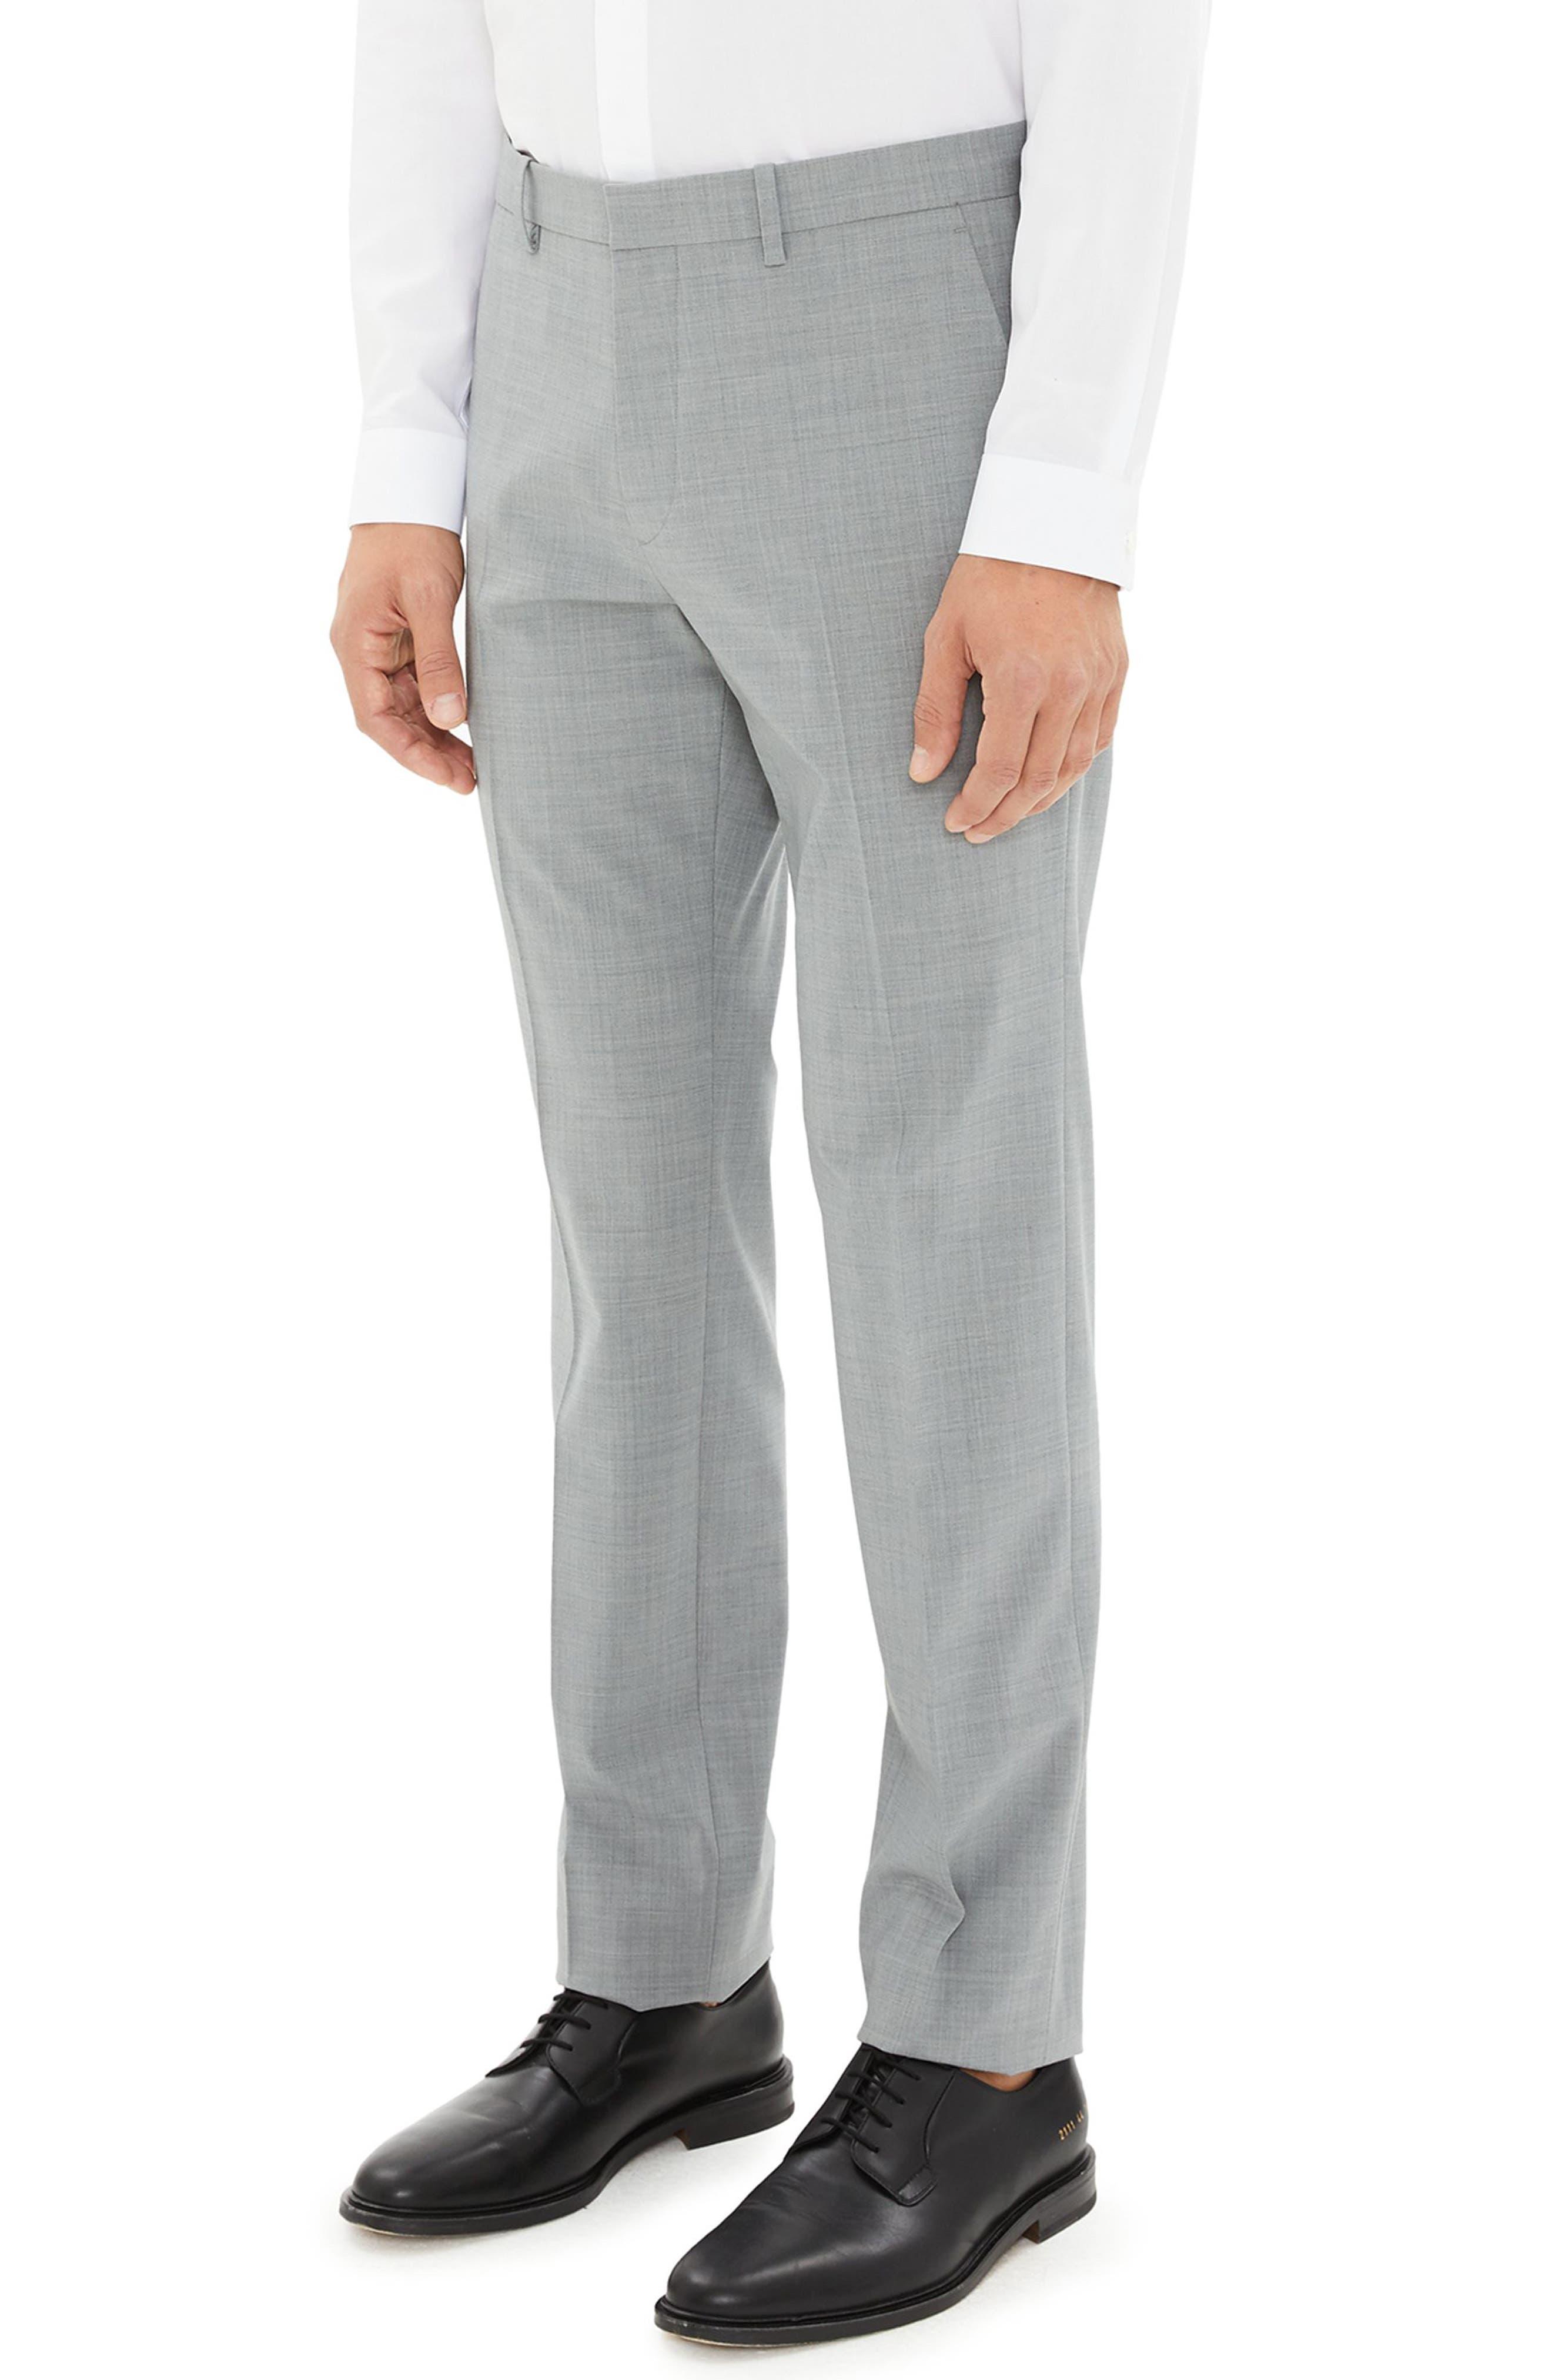 Mayer New Tailor 2 Wool Trousers,                             Alternate thumbnail 3, color,                             CHROME MELANGE